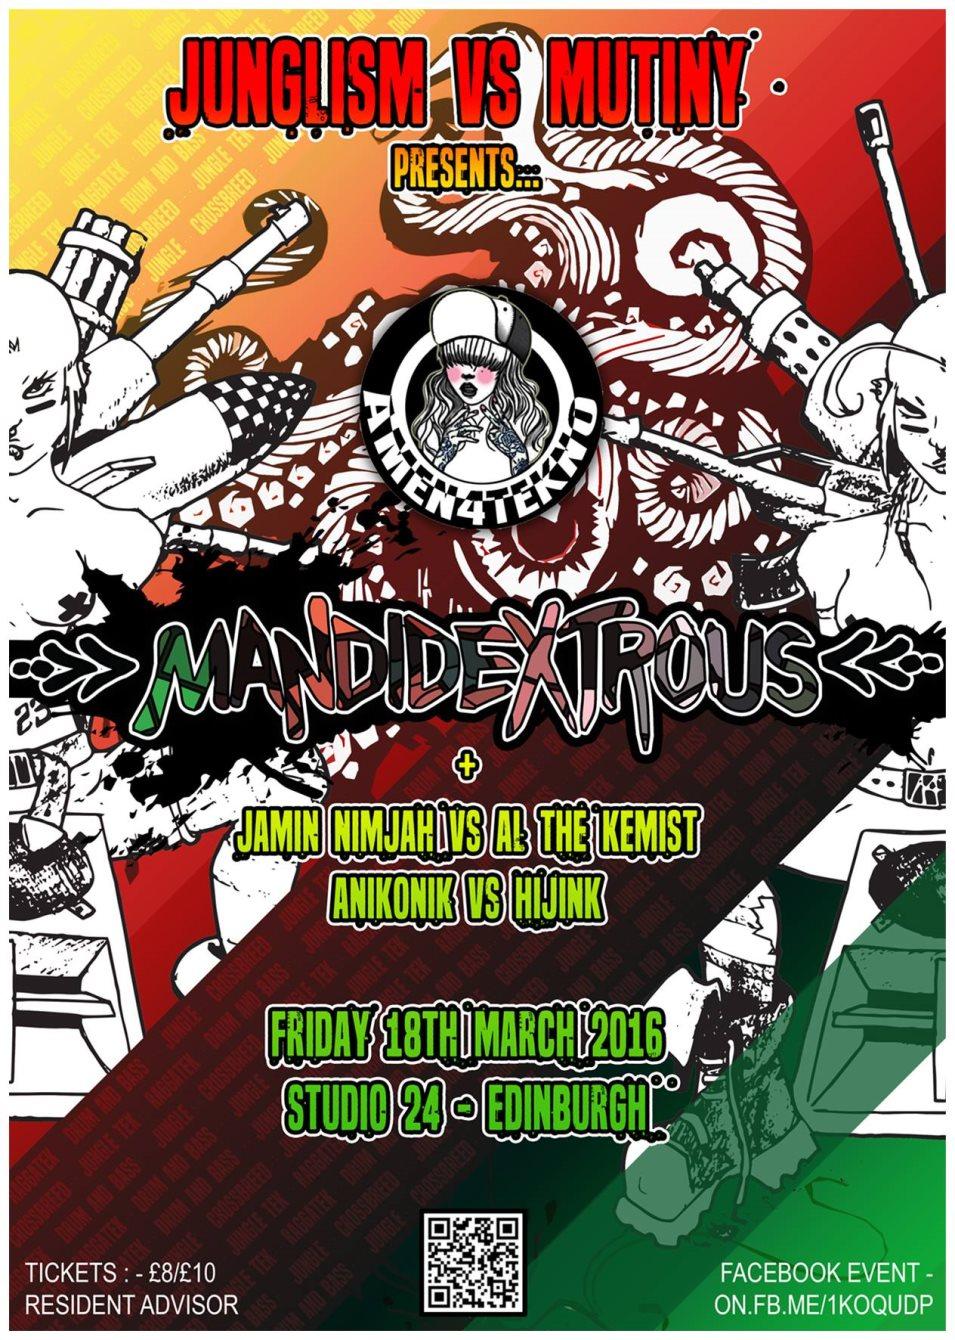 Junglism vs Mutiny presents Mandidextrous - Flyer front